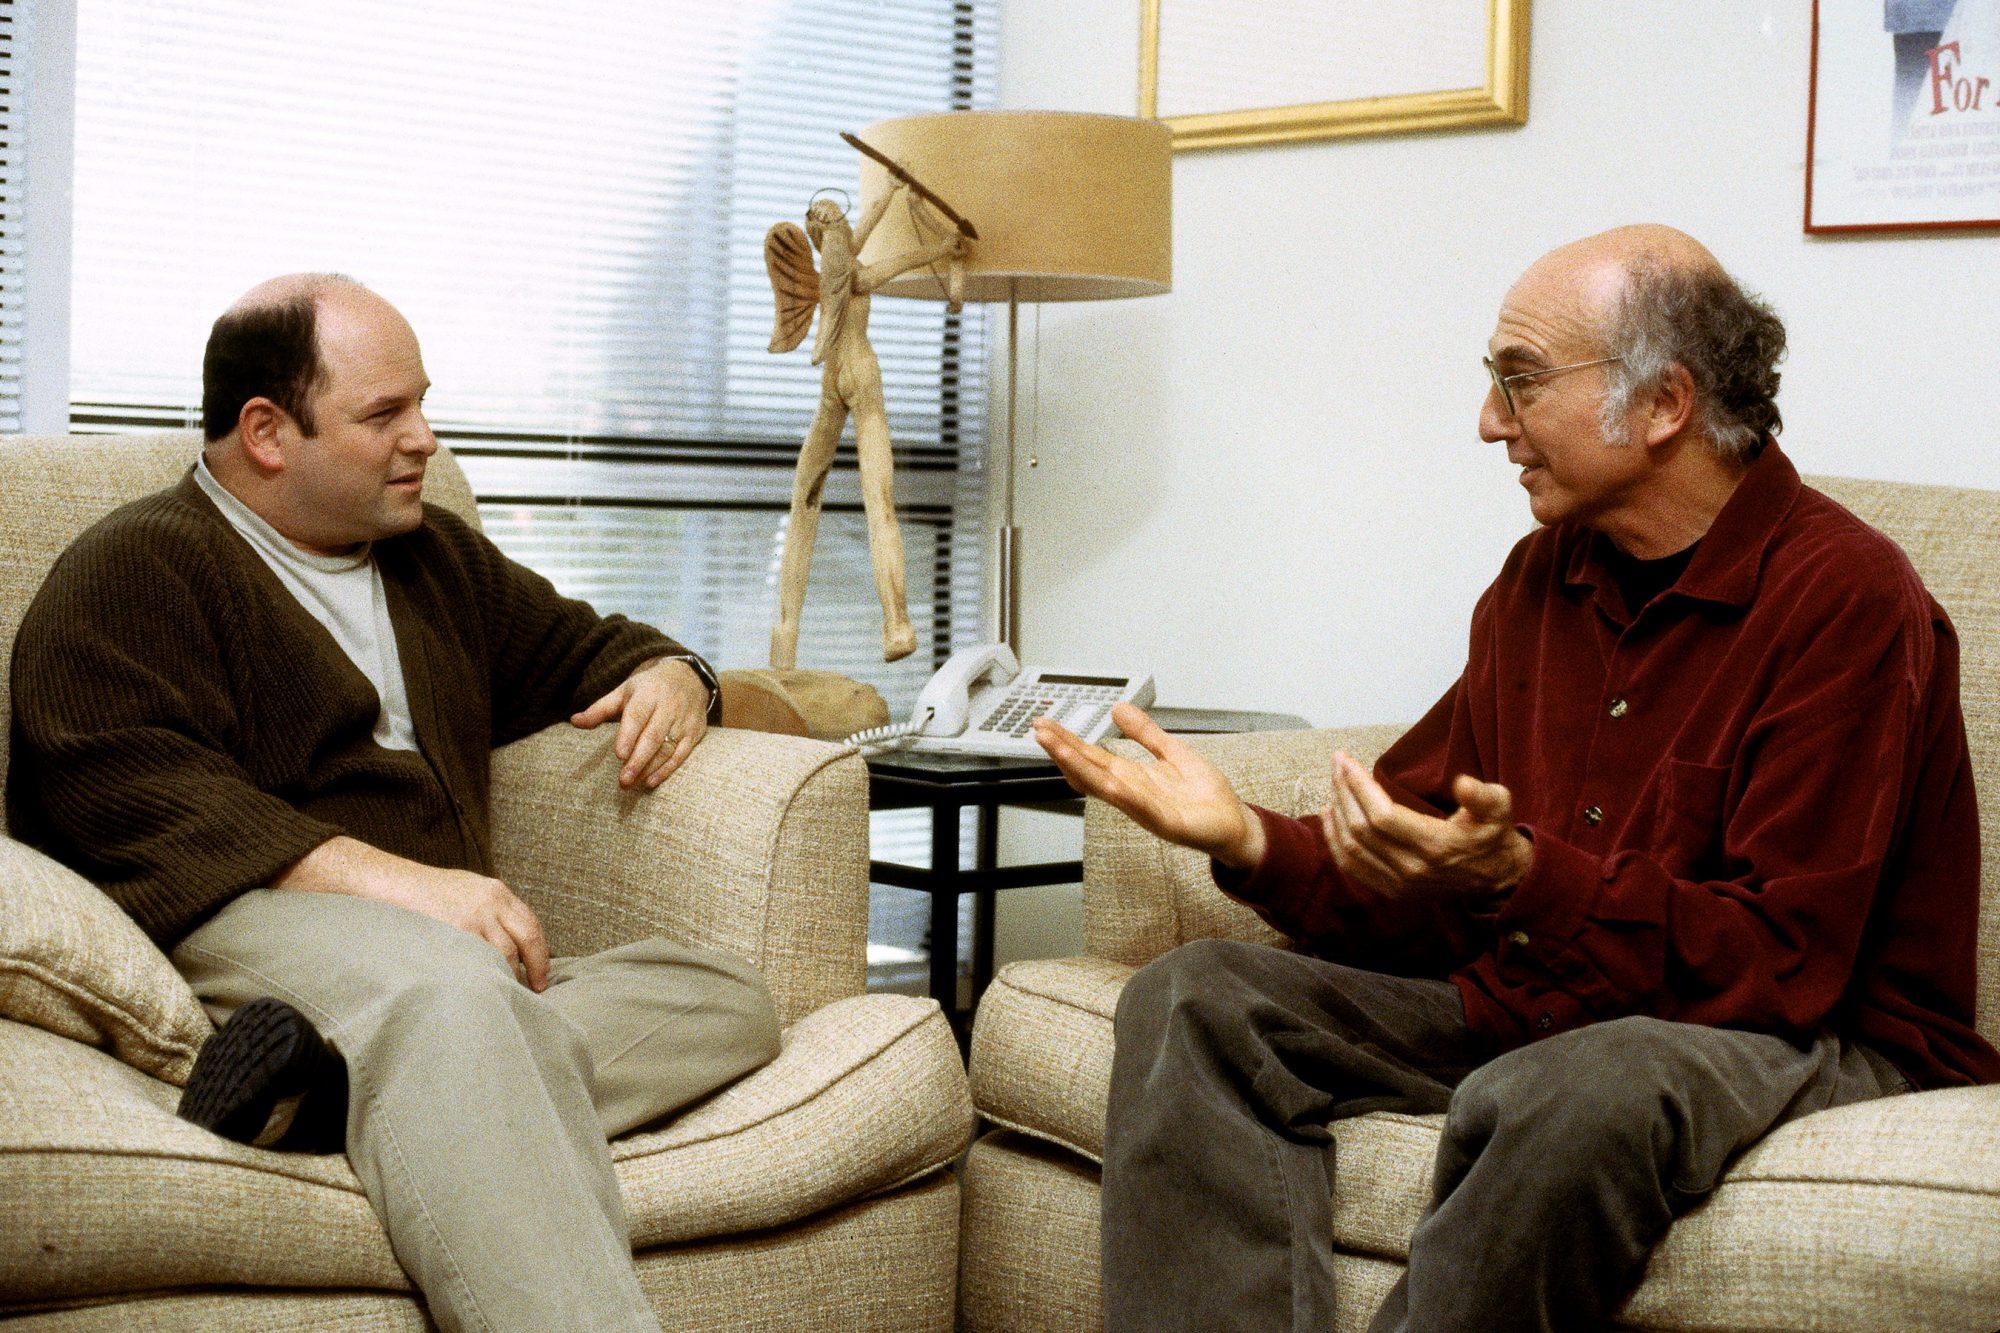 Curb Your Enthusiasm -Season 2 (2001)L-R: Jason Alexander and Larry David